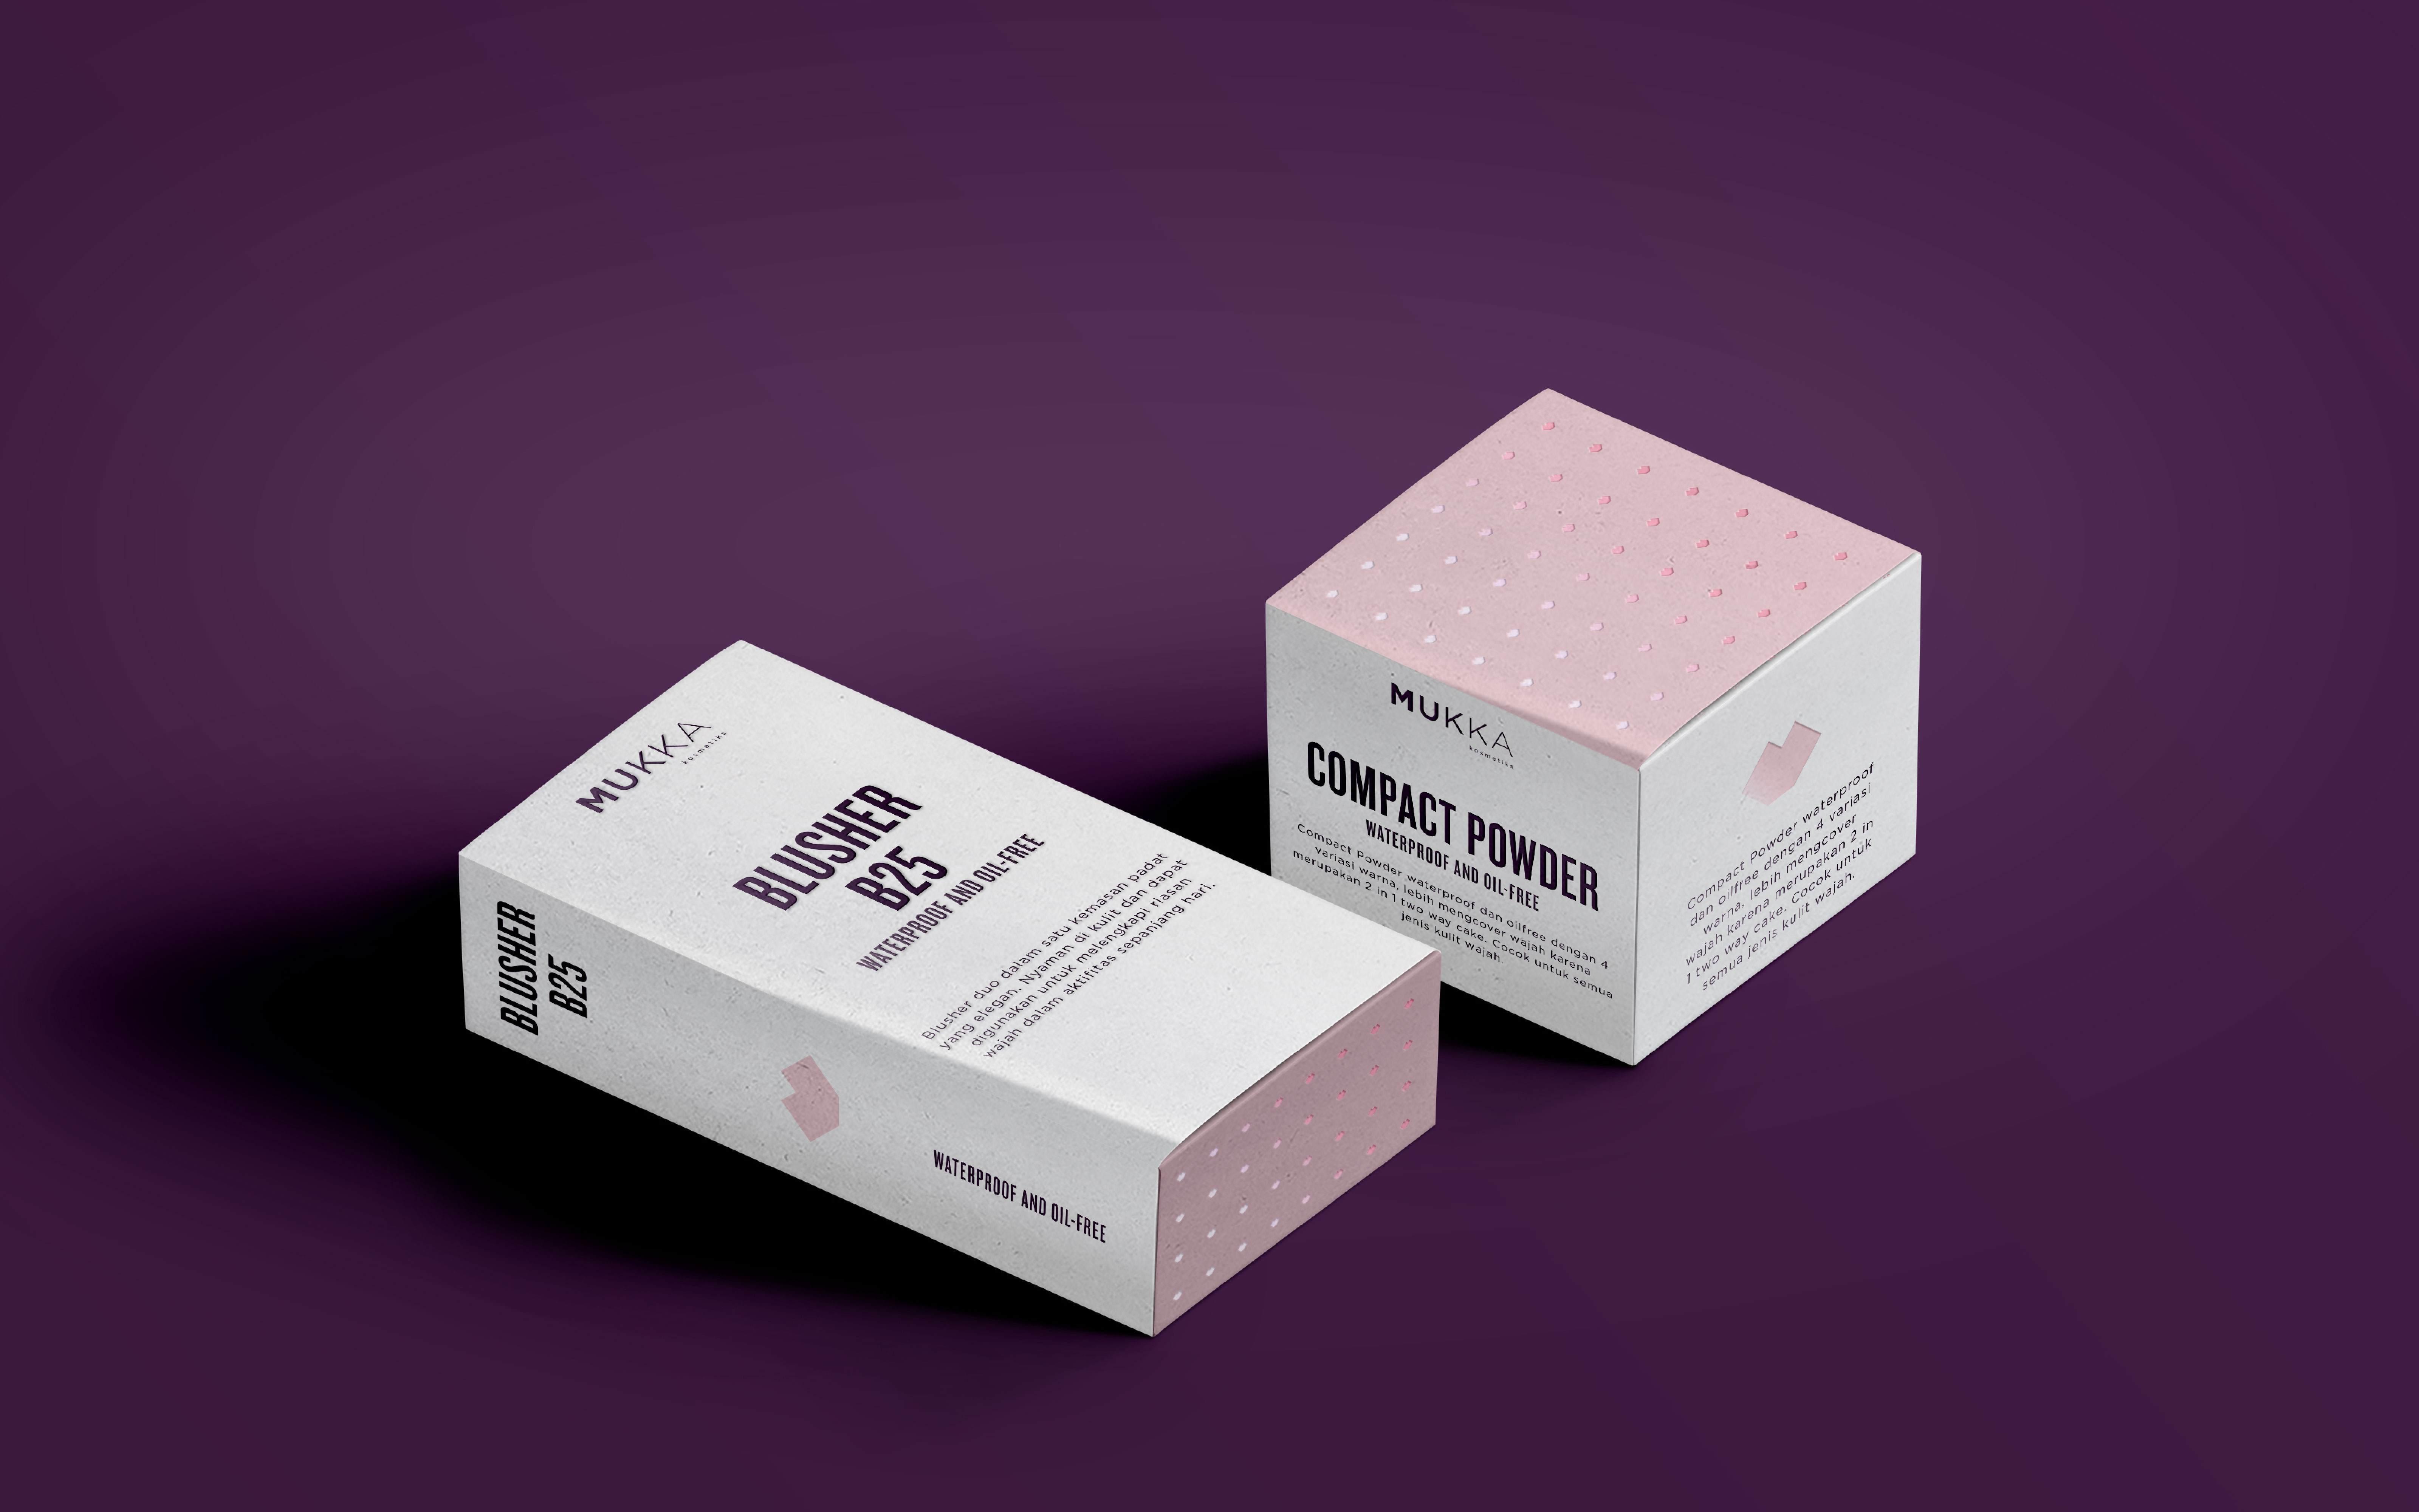 Mukka Blusher B25 Daftar Harga Terkini Terlengkap Eye Shadow 7016 Cosmetics Branding By Unika Studio